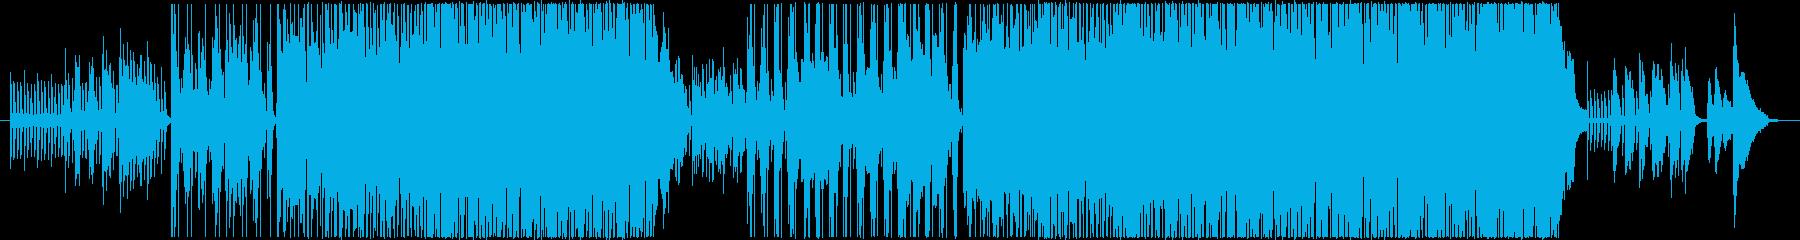 C-POPでギター曲の再生済みの波形